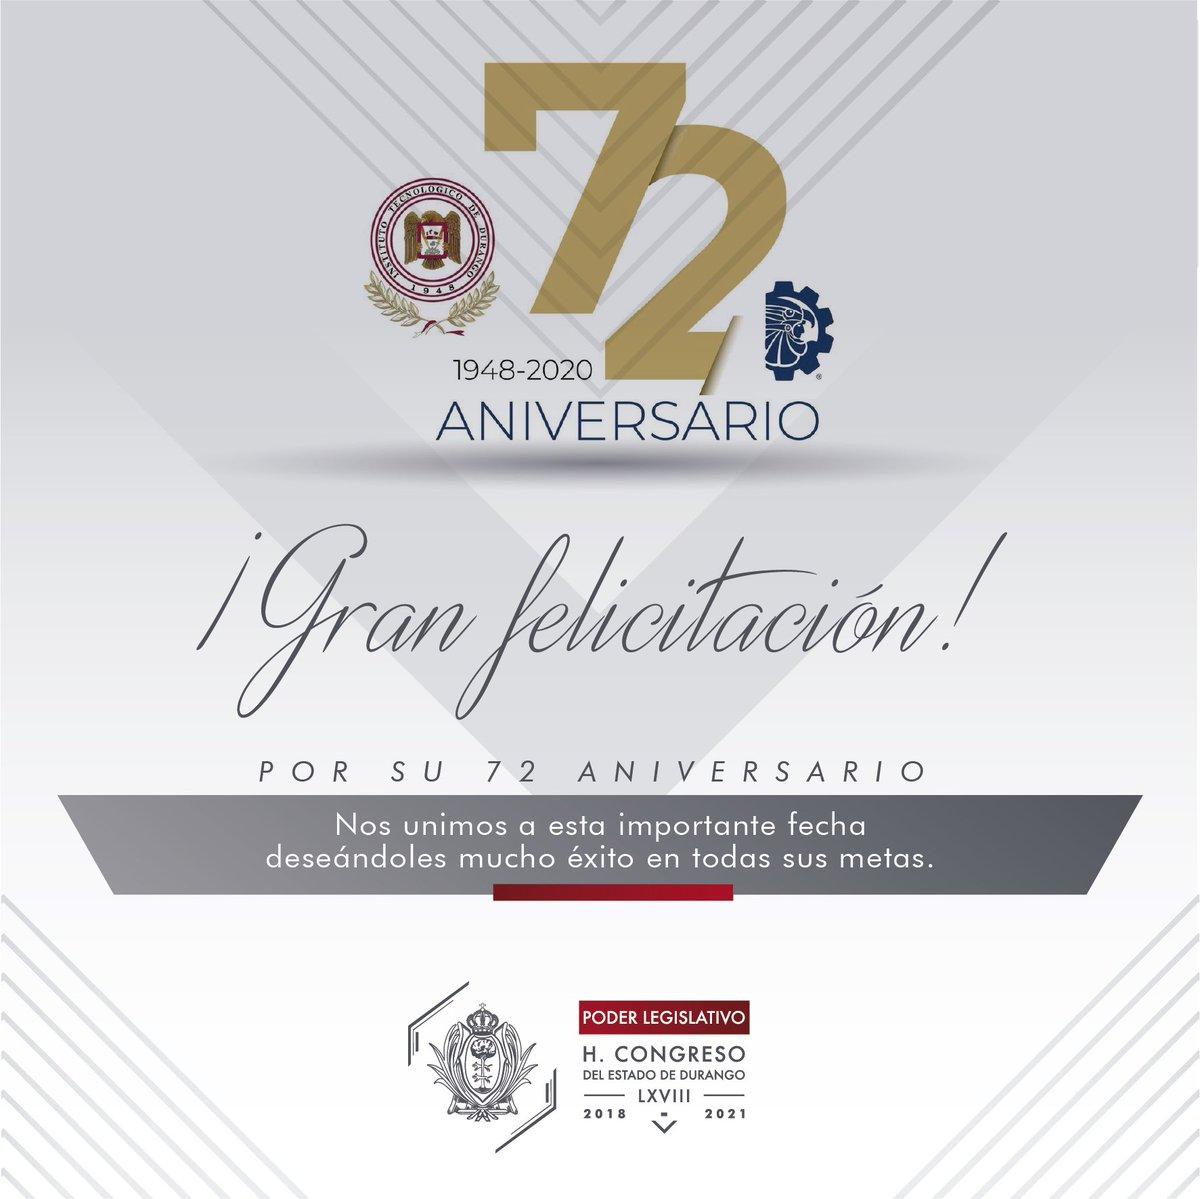 CongresoDurango photo